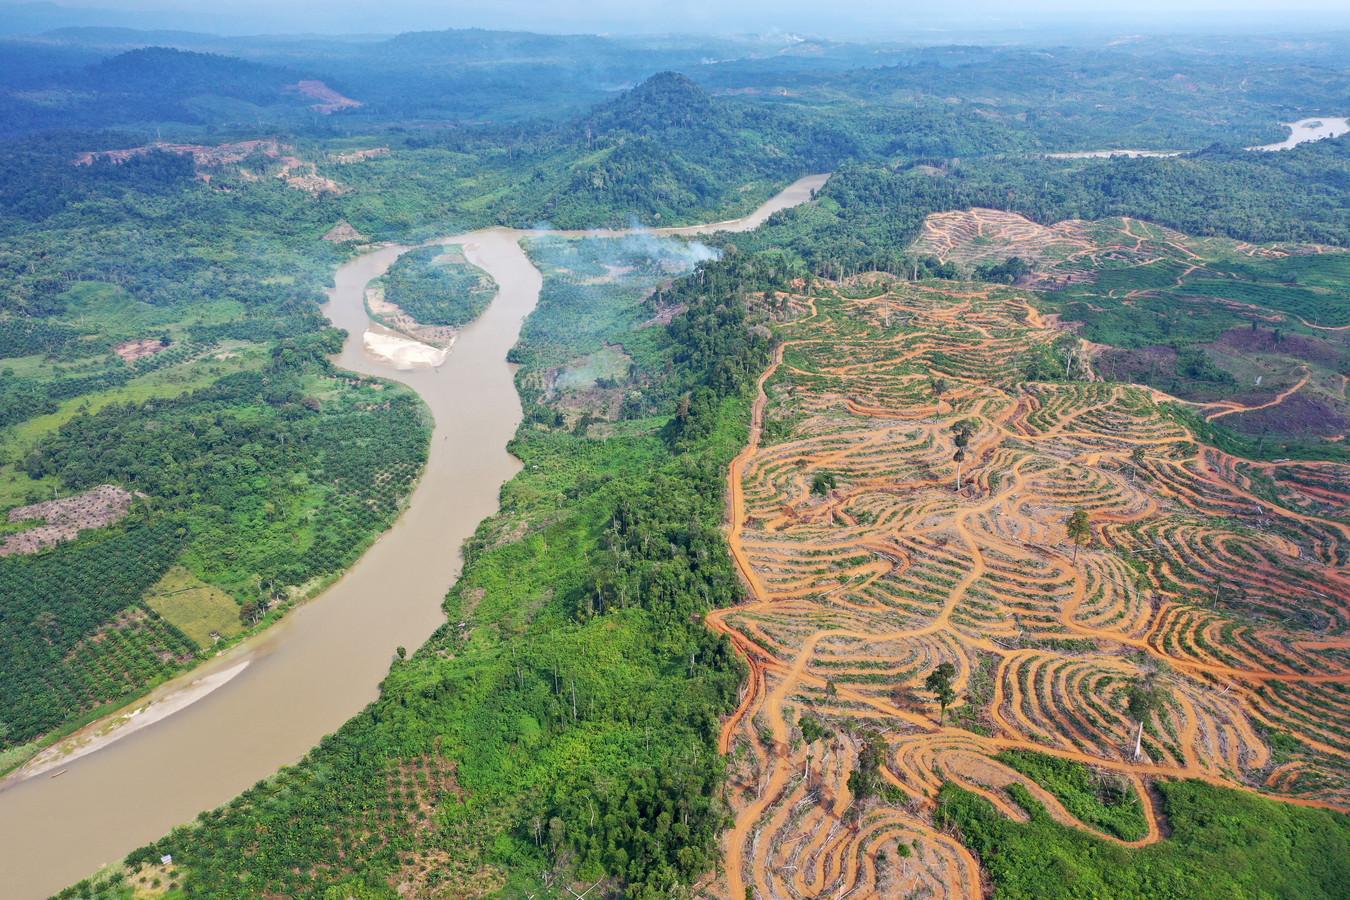 Ontbossing voor palmolieplantages in Indonesië.